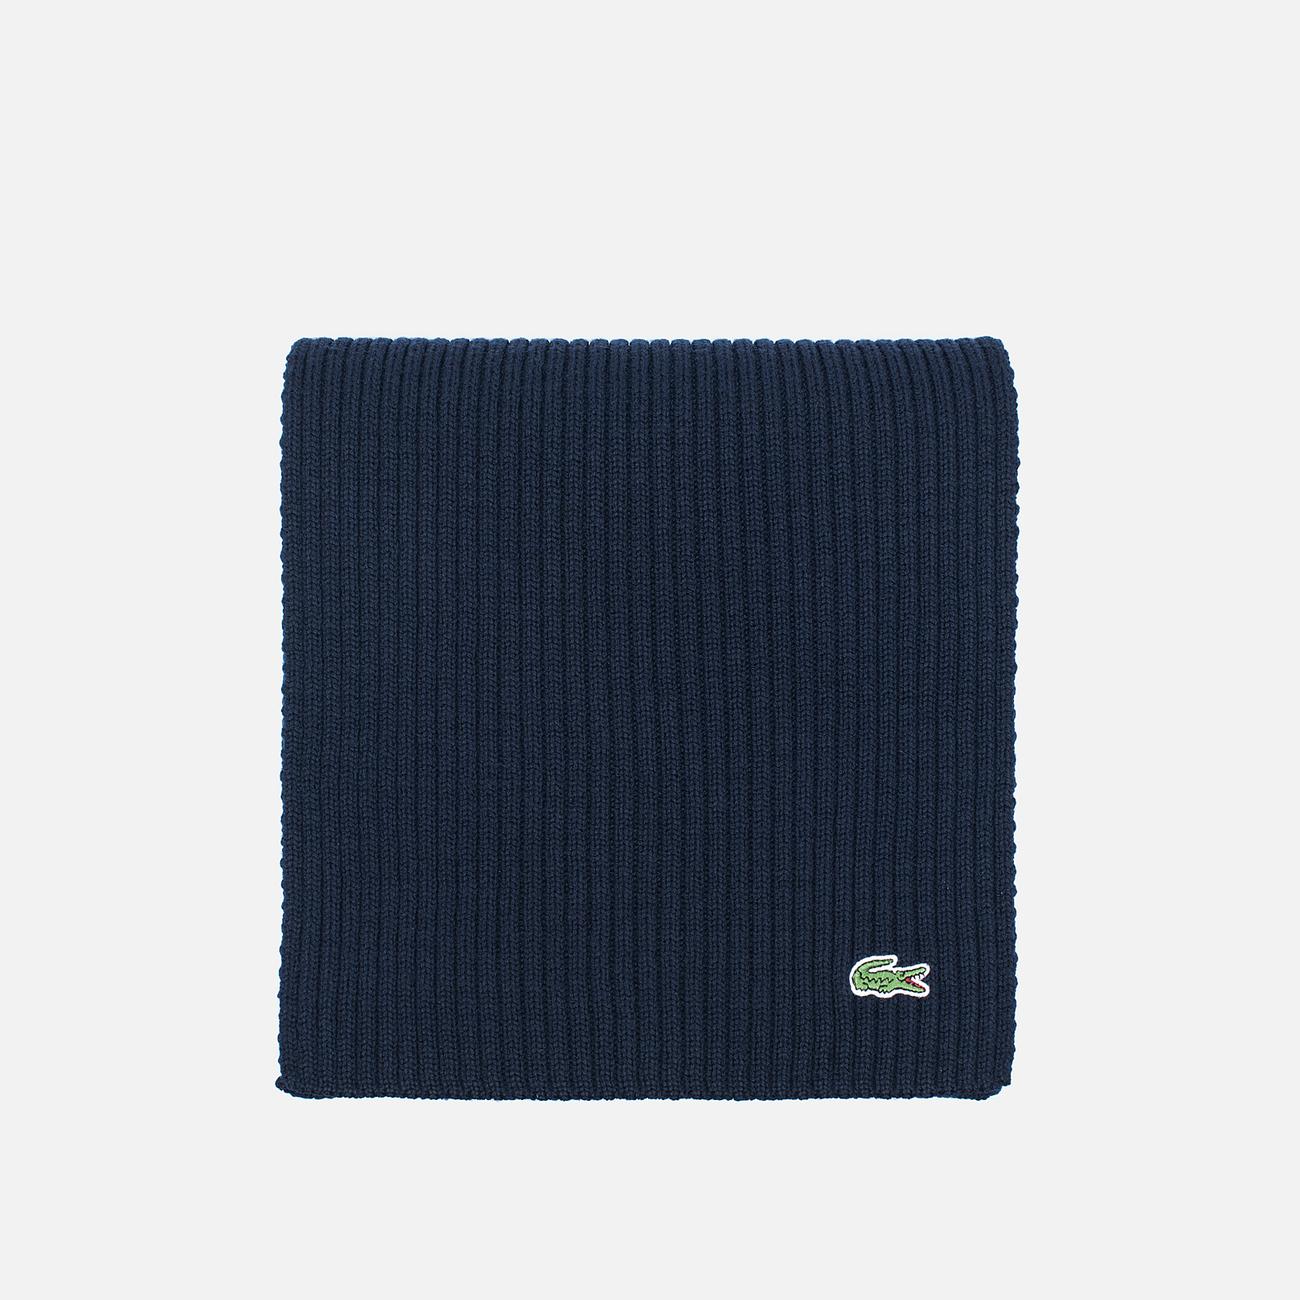 Шарф Lacoste Green Croc Wool Navy